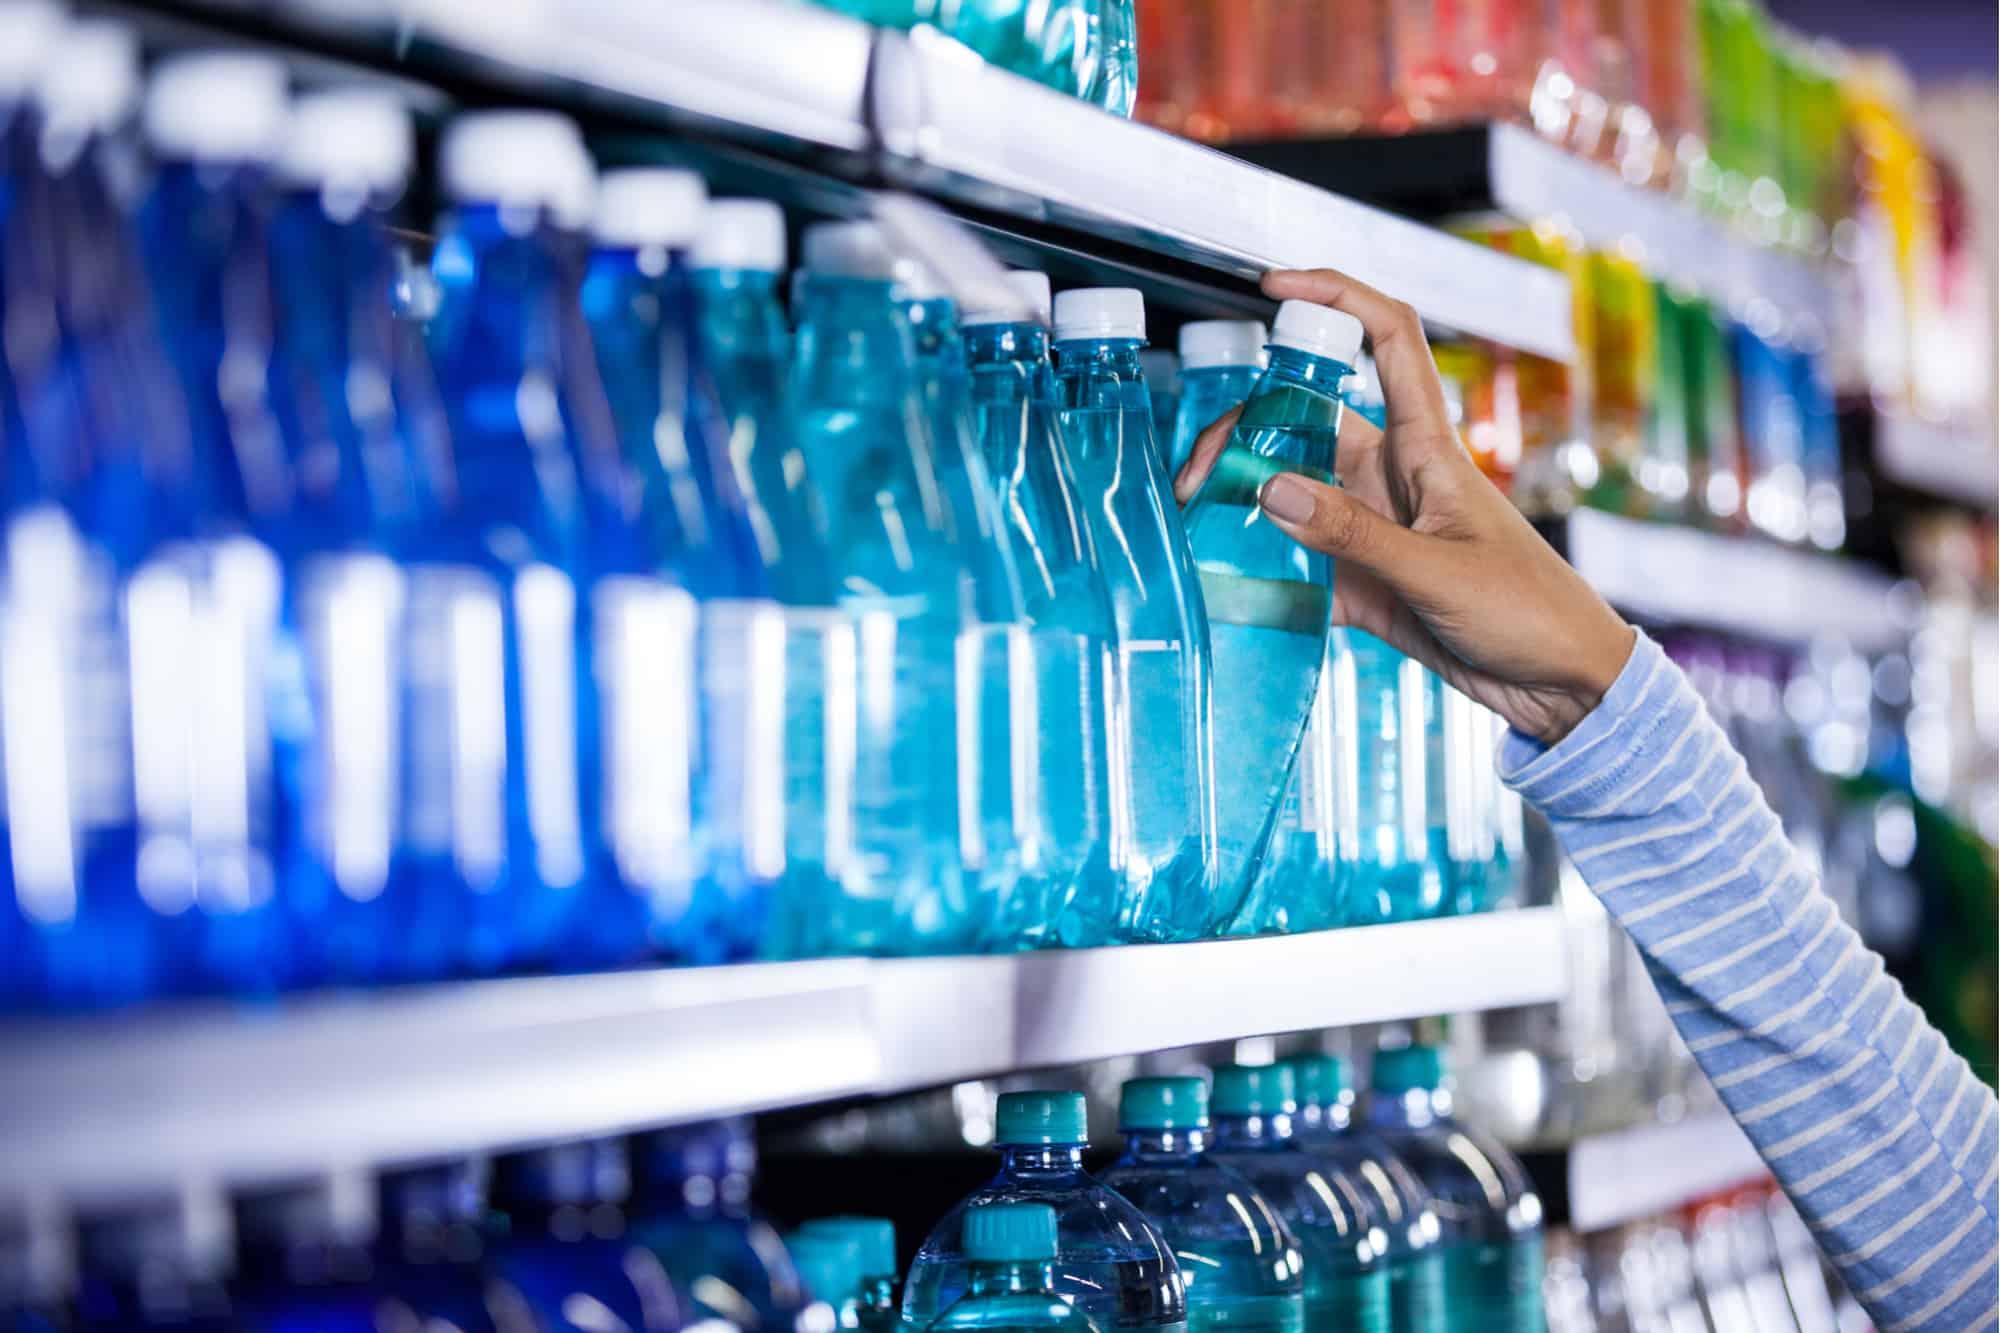 Maximize on Product Shelf Space